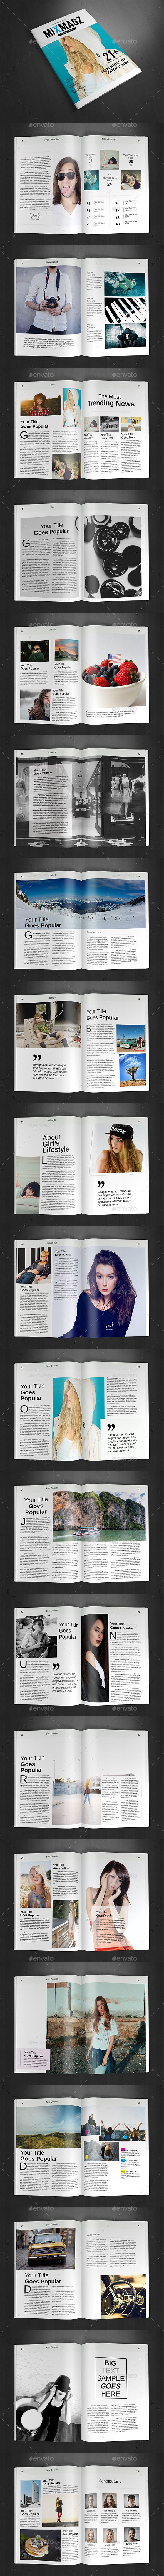 A4 Magazine Template Vol.29 | Pinterest